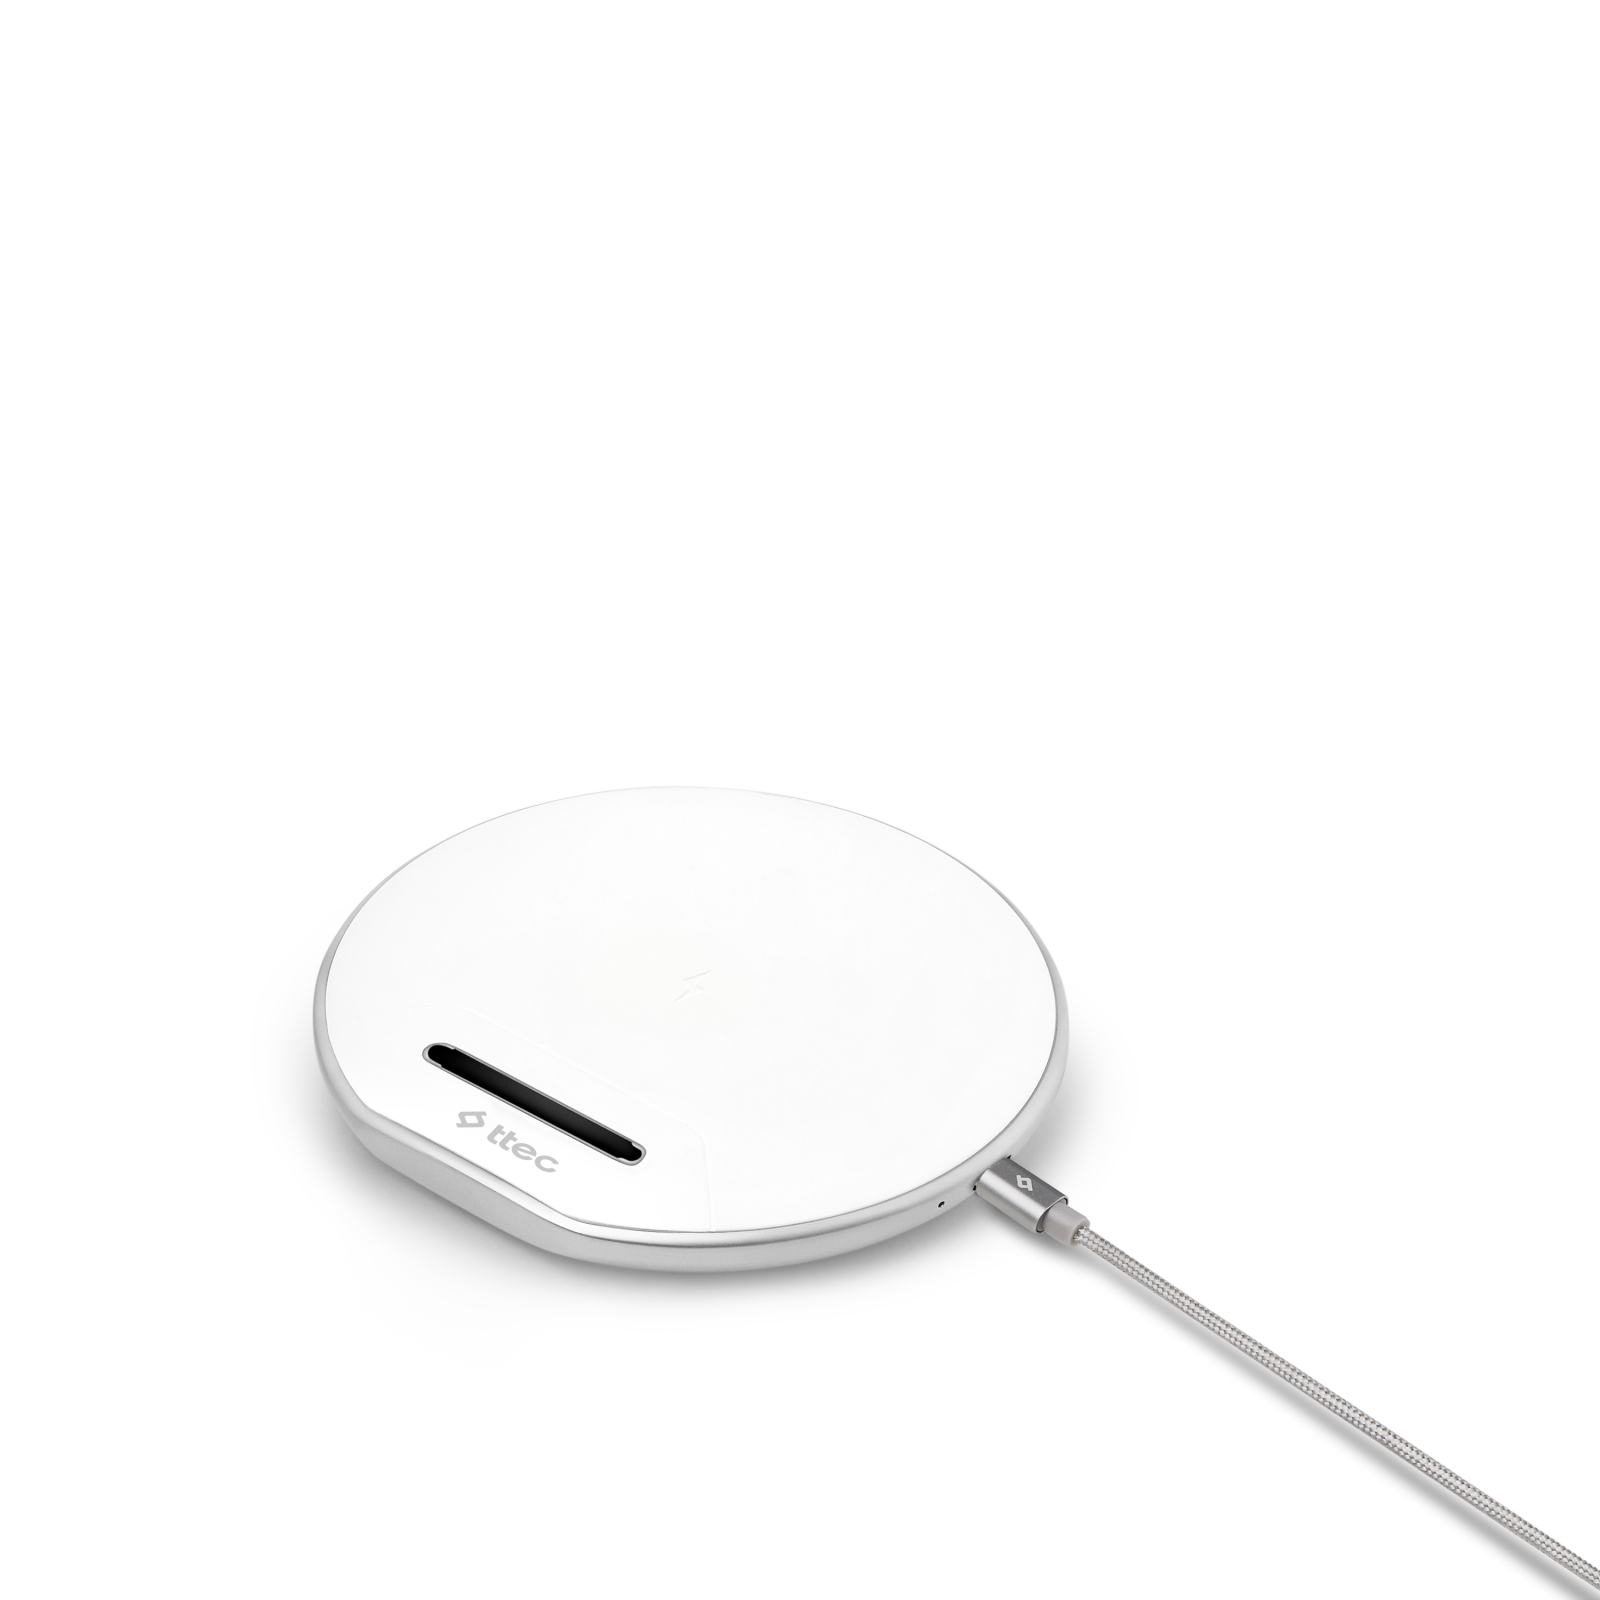 Безжично зарядно Air Charger  Wireless Charger - Бяло